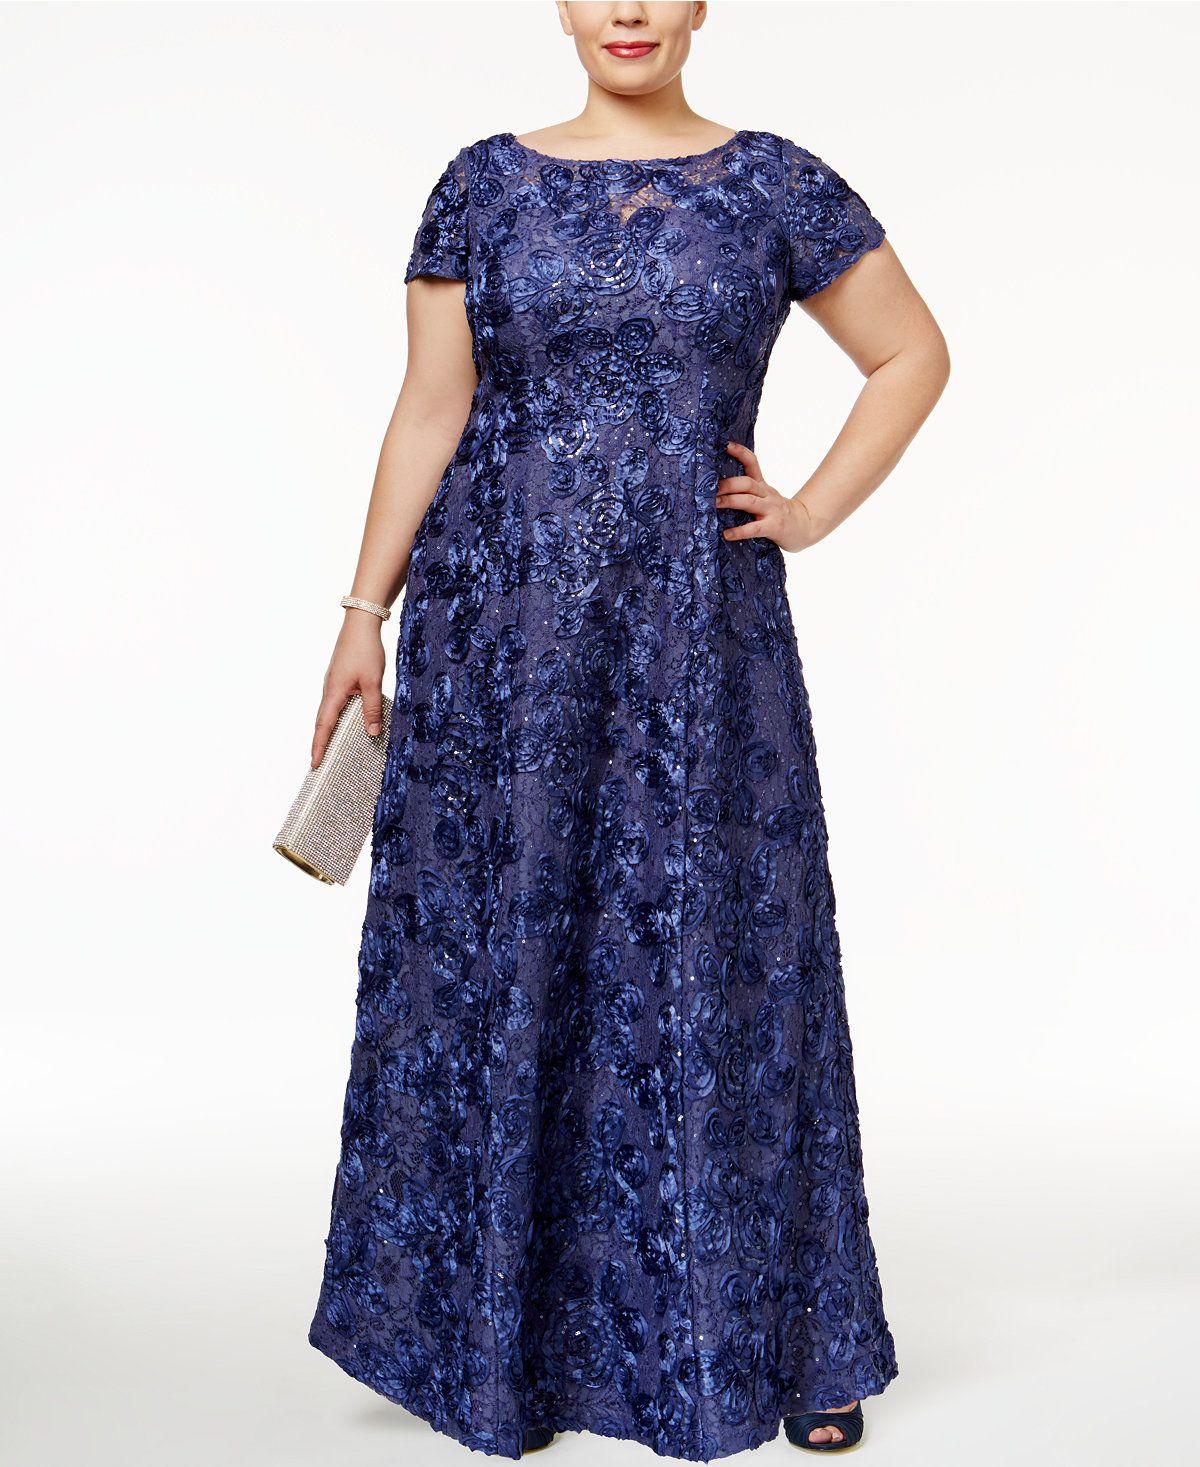 5d231904165b This A-line lace rosette pattern is flattering and elegant! | Macy's - Alex  Evenings Plus Size Rosette Lace A-Line Gown